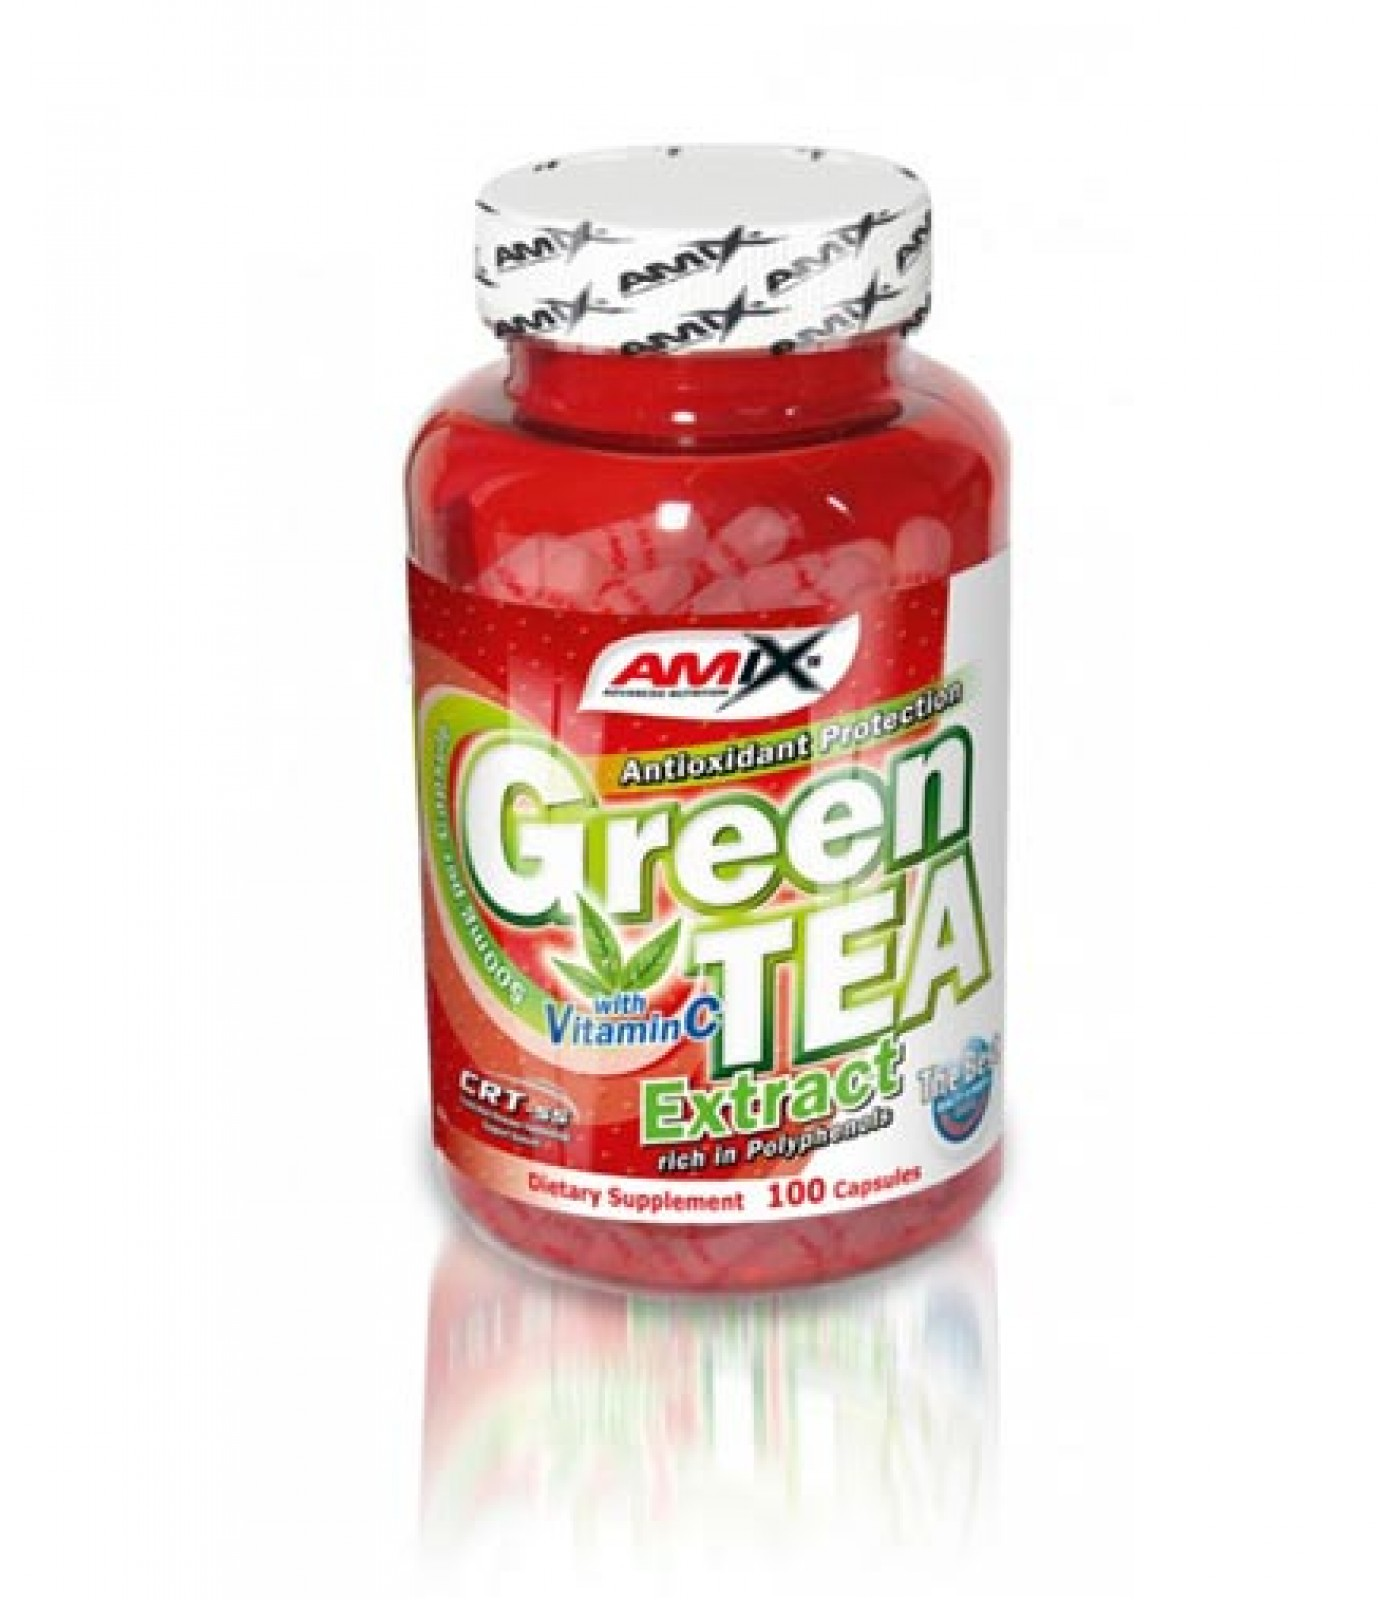 Amix - Green Tea Extract with Vitamin C / 100 caps.